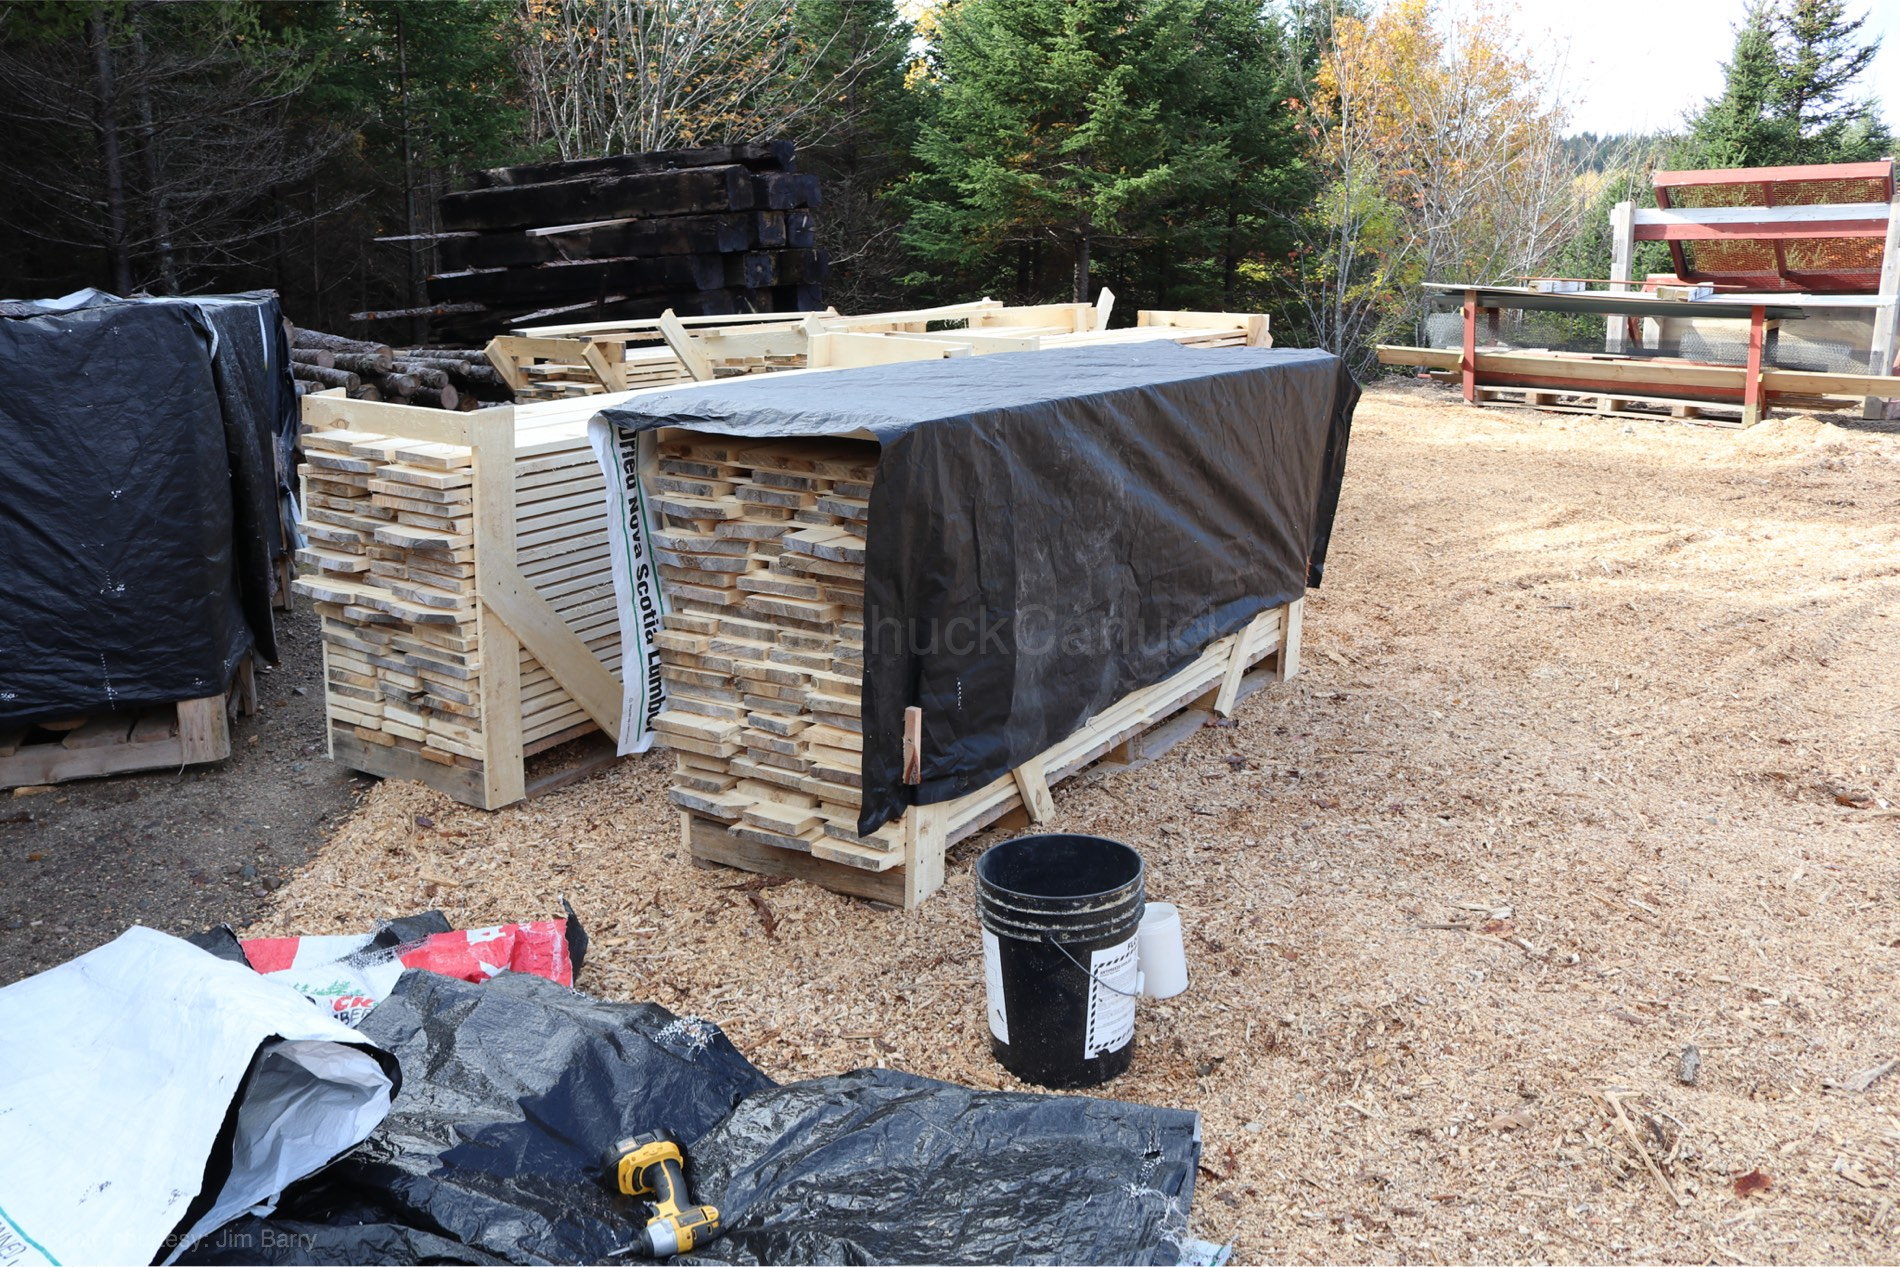 Stacks of poplar planks